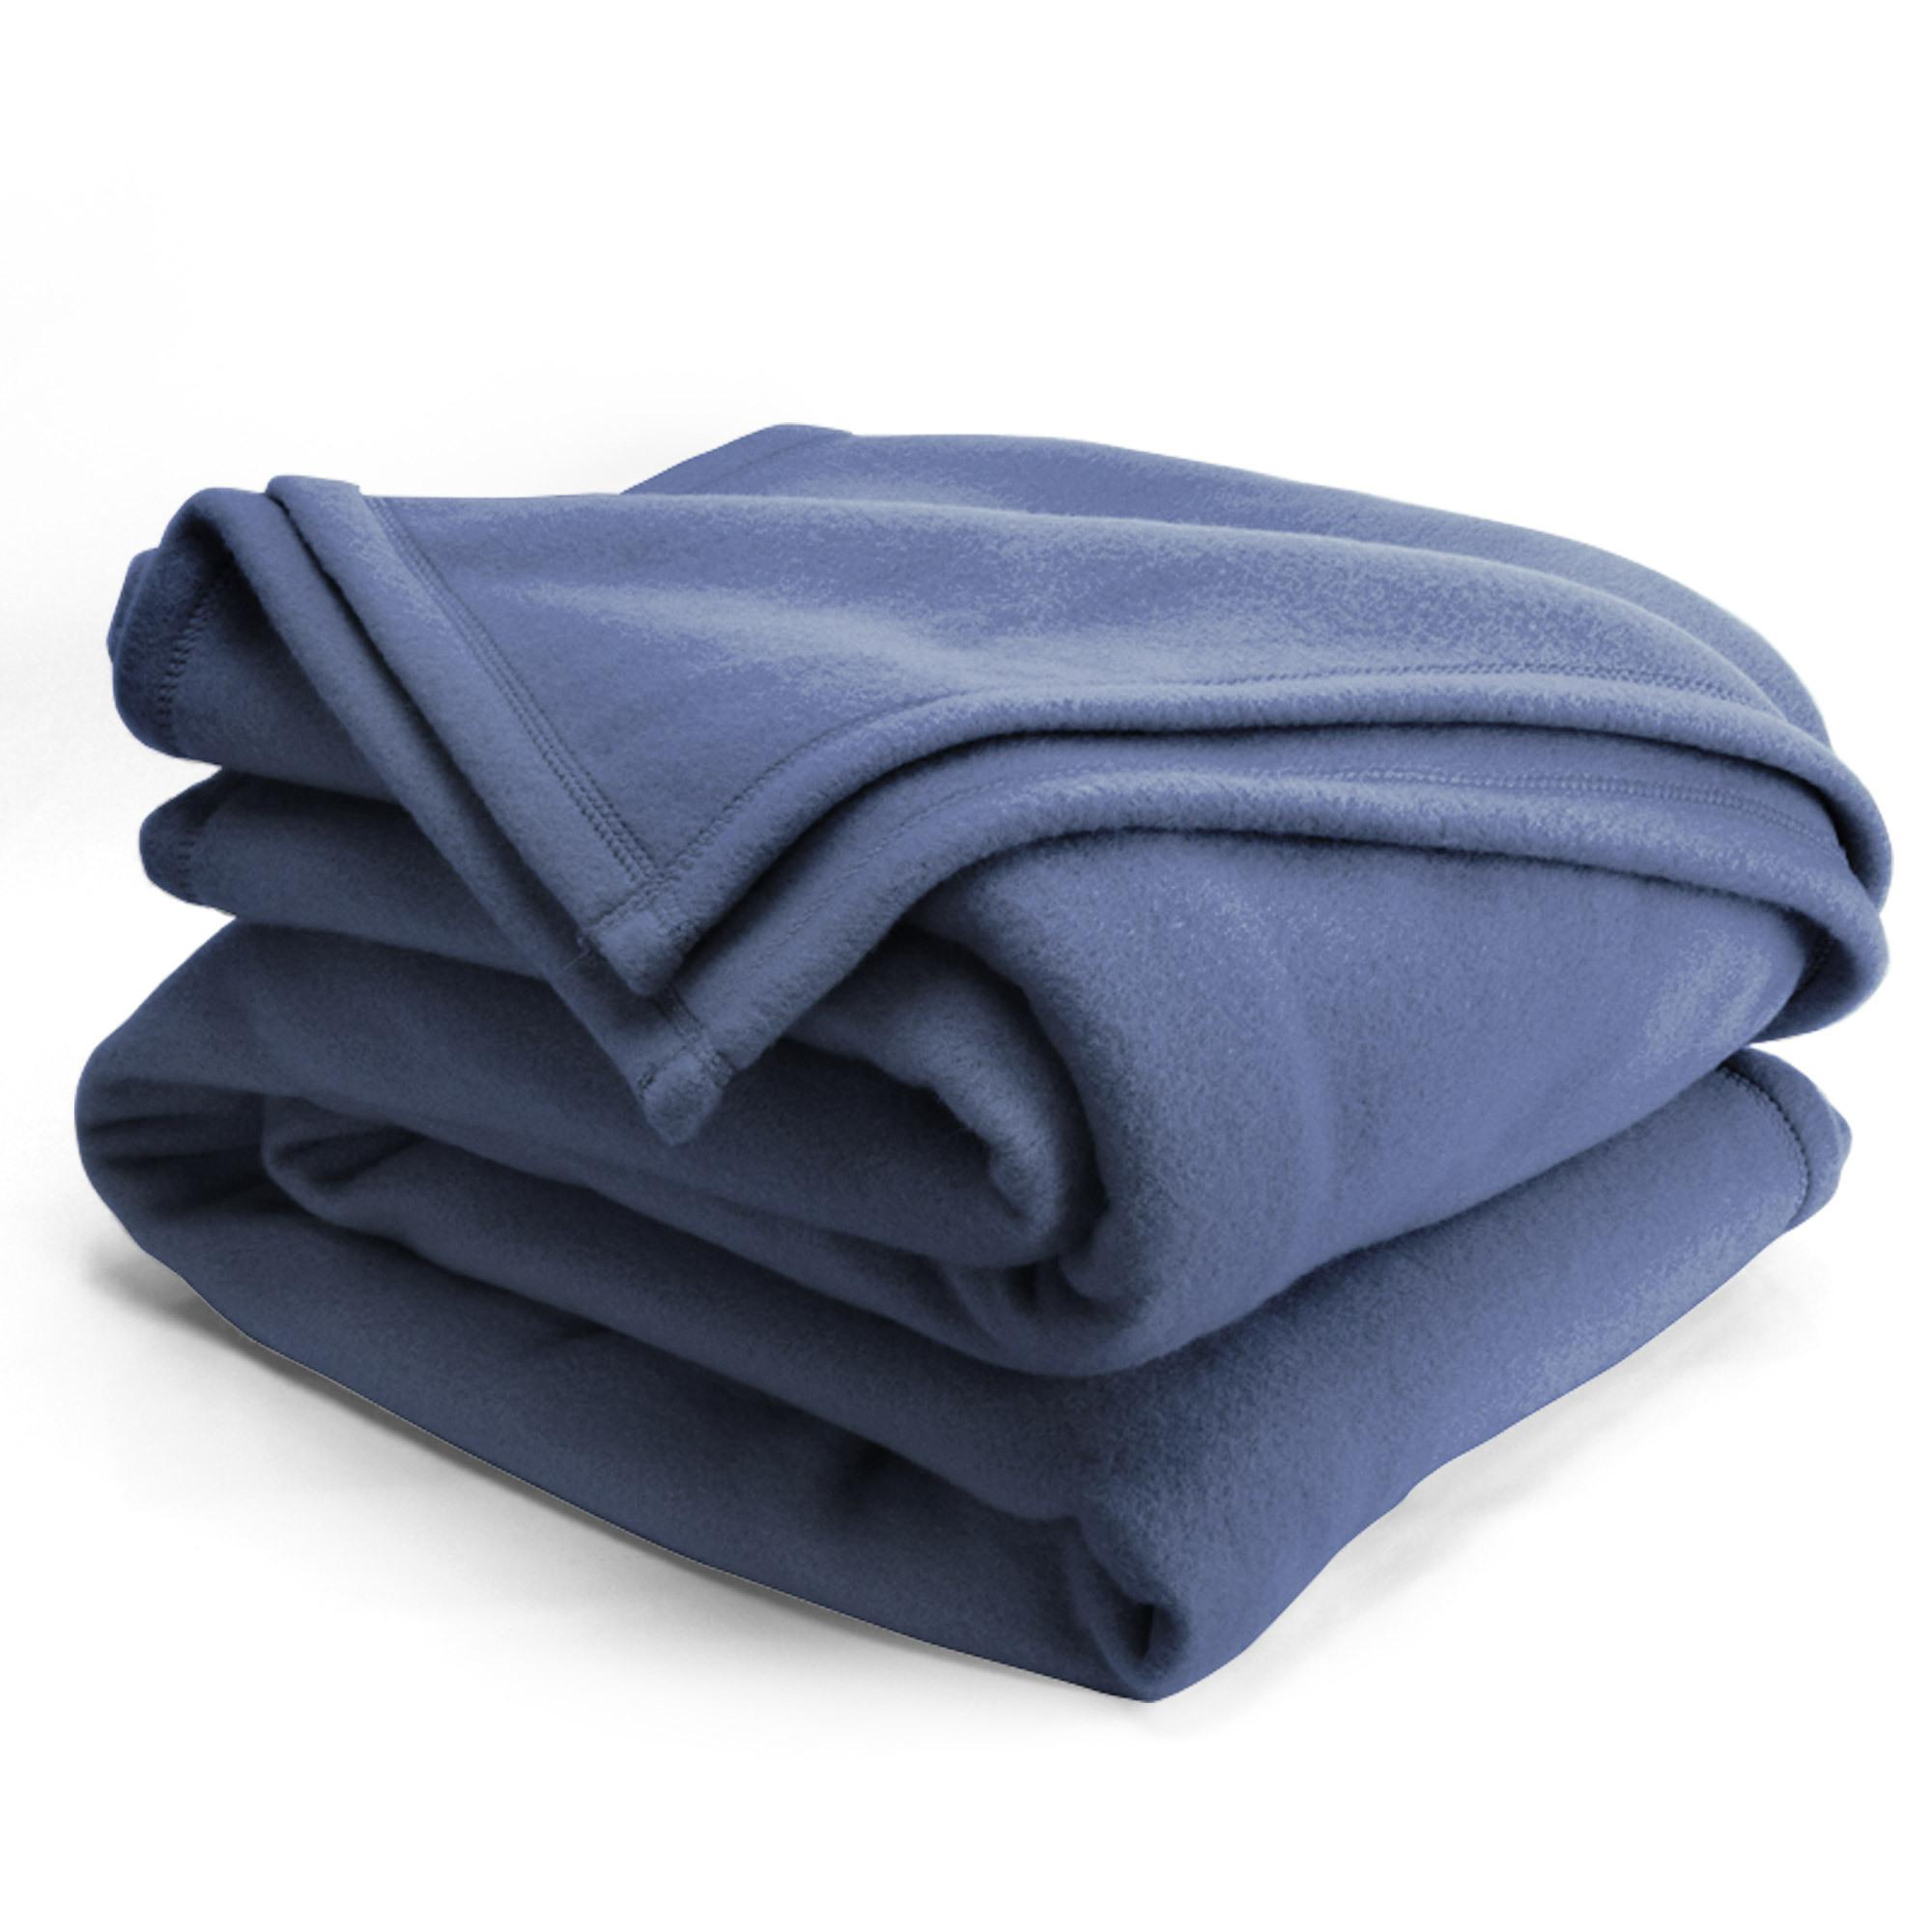 couverture polaire 220x240 cm isba marine 100 polyester 320 g m2 trait non feu linnea. Black Bedroom Furniture Sets. Home Design Ideas